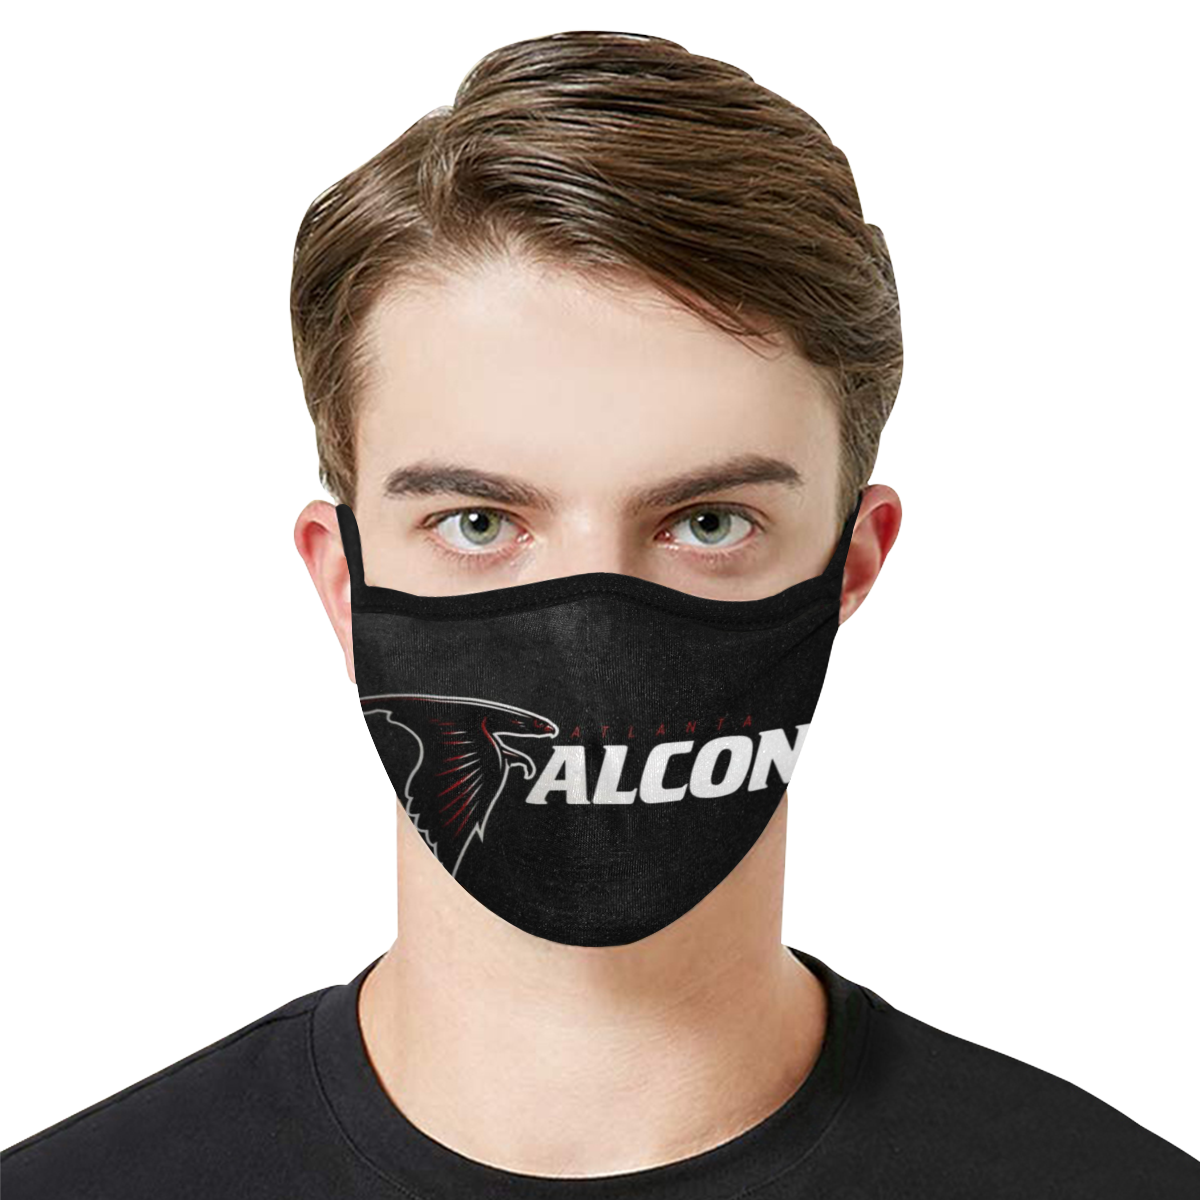 Atlanta Falcons Face Mask PM2.5